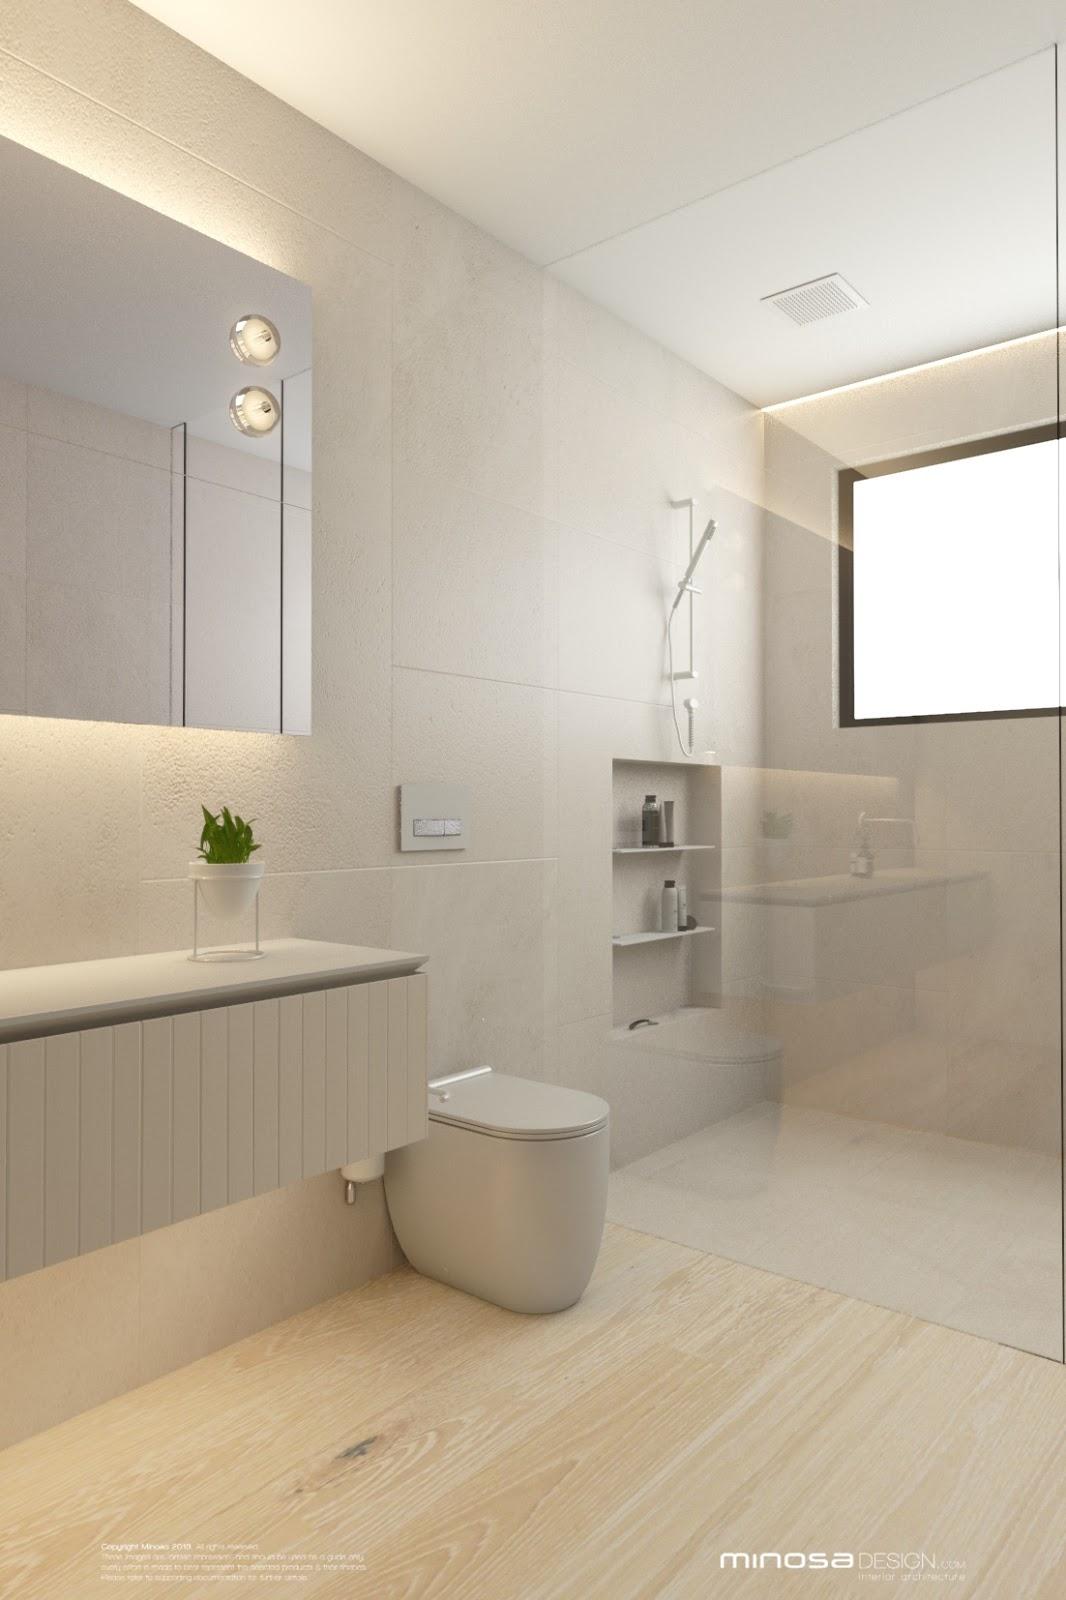 Minosa: Bathroom Design - Less is More on school bathroom tile, nature bathroom tile, masculine paint, single bathroom tile, natural bathroom tile, common bathroom tile, light bathroom tile, geometric bathroom tile, contemporary bathroom tile, smooth bathroom tile, floral bathroom tile, classy bathroom tile, home bathroom tile, sexy bathroom tile, earthy bathroom tile, masculine kitchen, male bathroom tile, women bathroom tile, straight bathroom tile, funny bathroom tile,